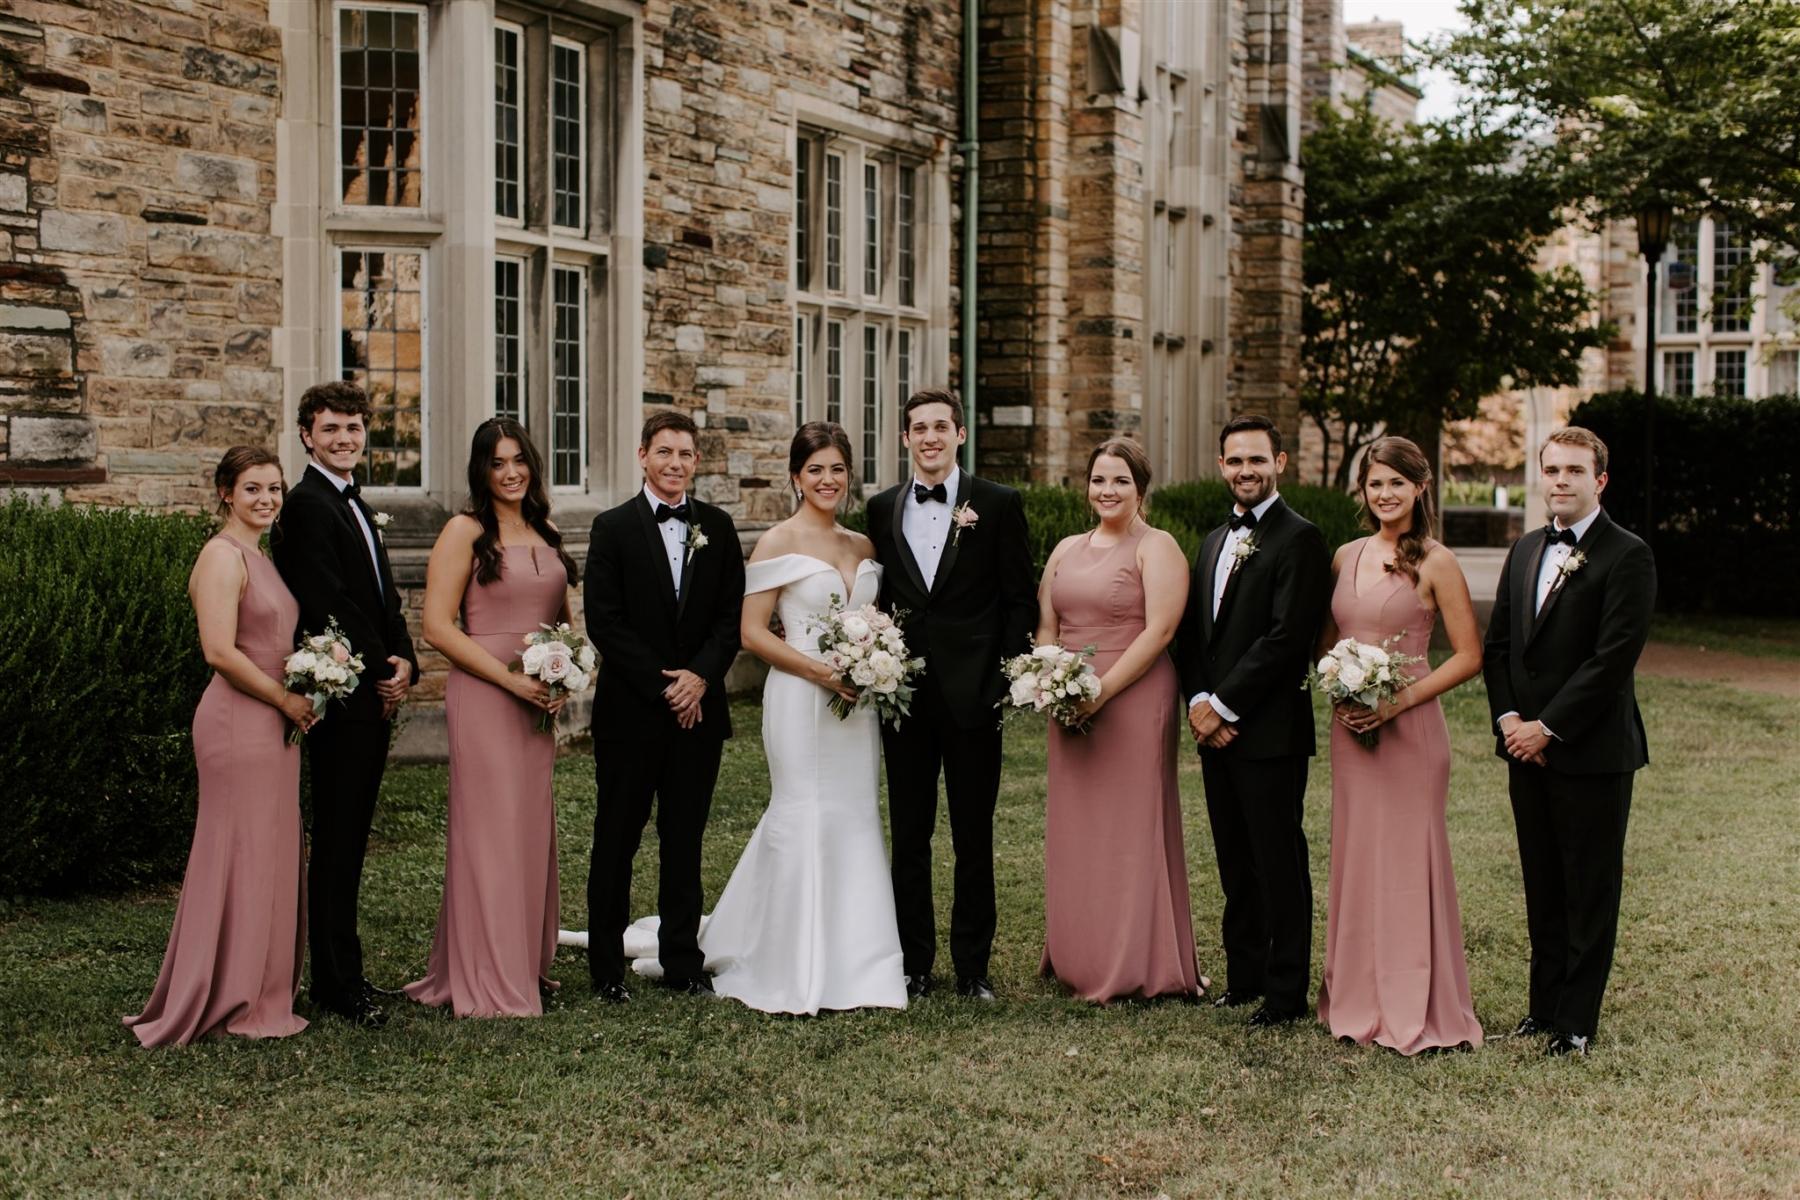 Wedding party photography by Caitlin Steva